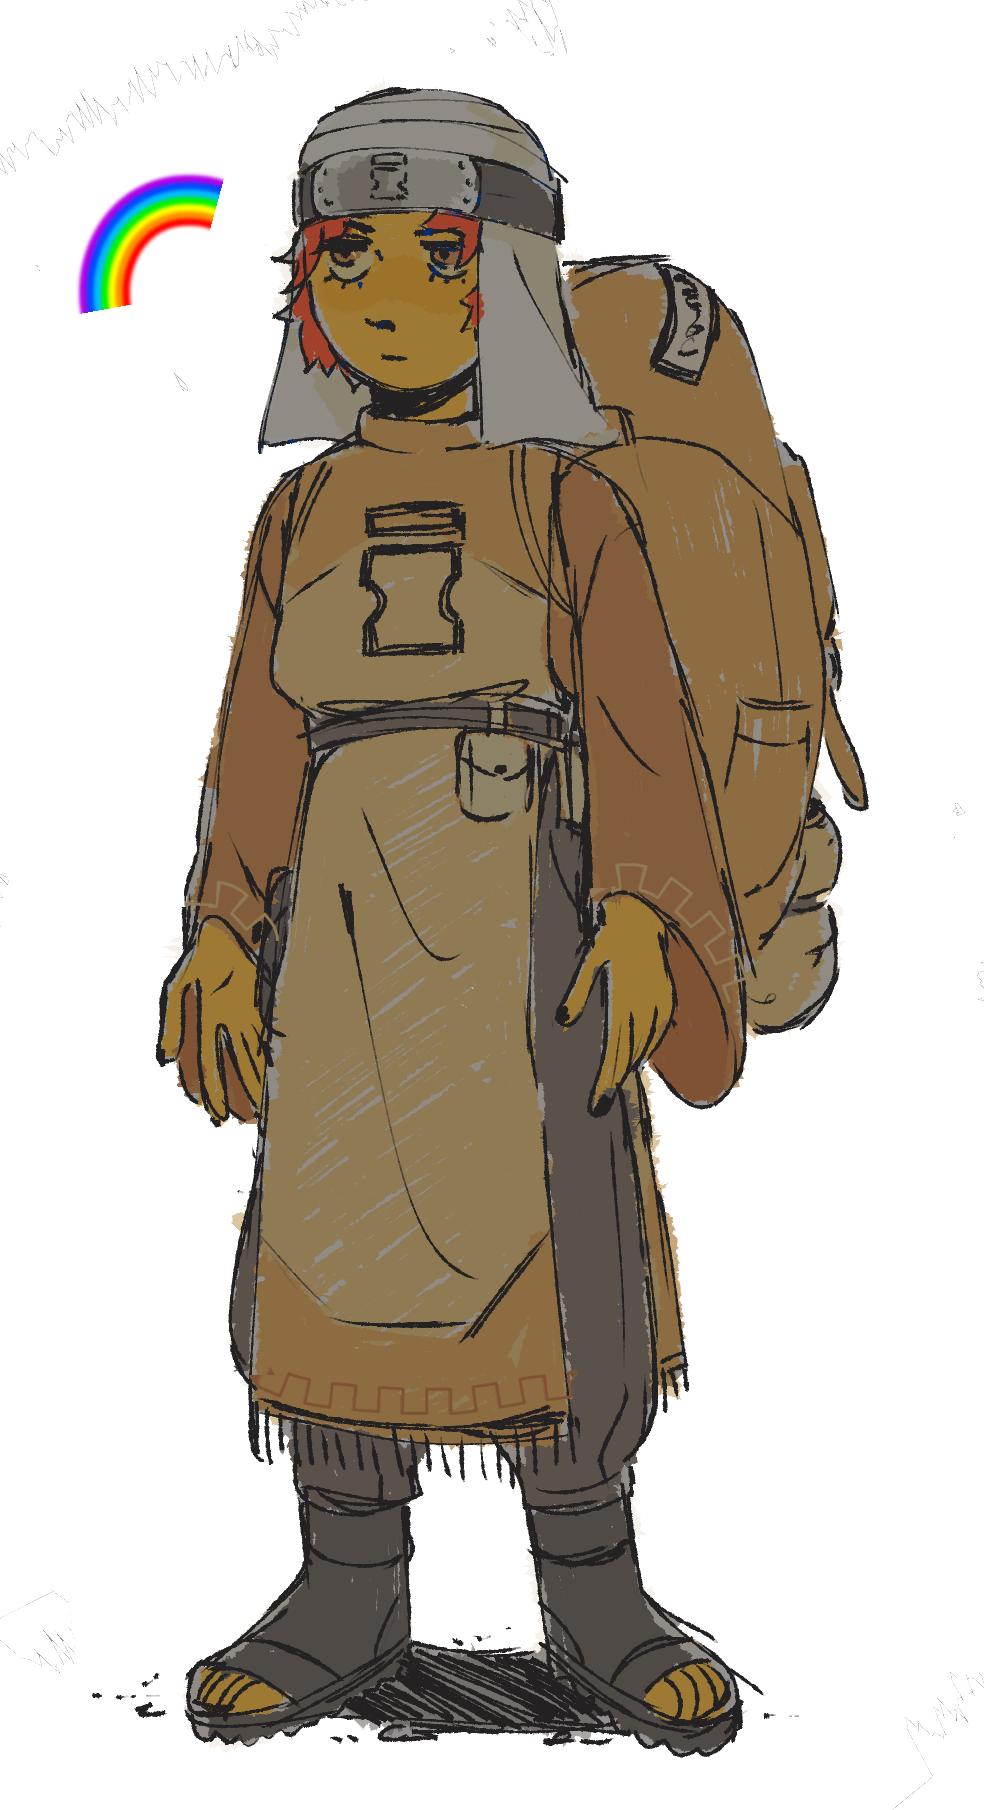 sasori sketch